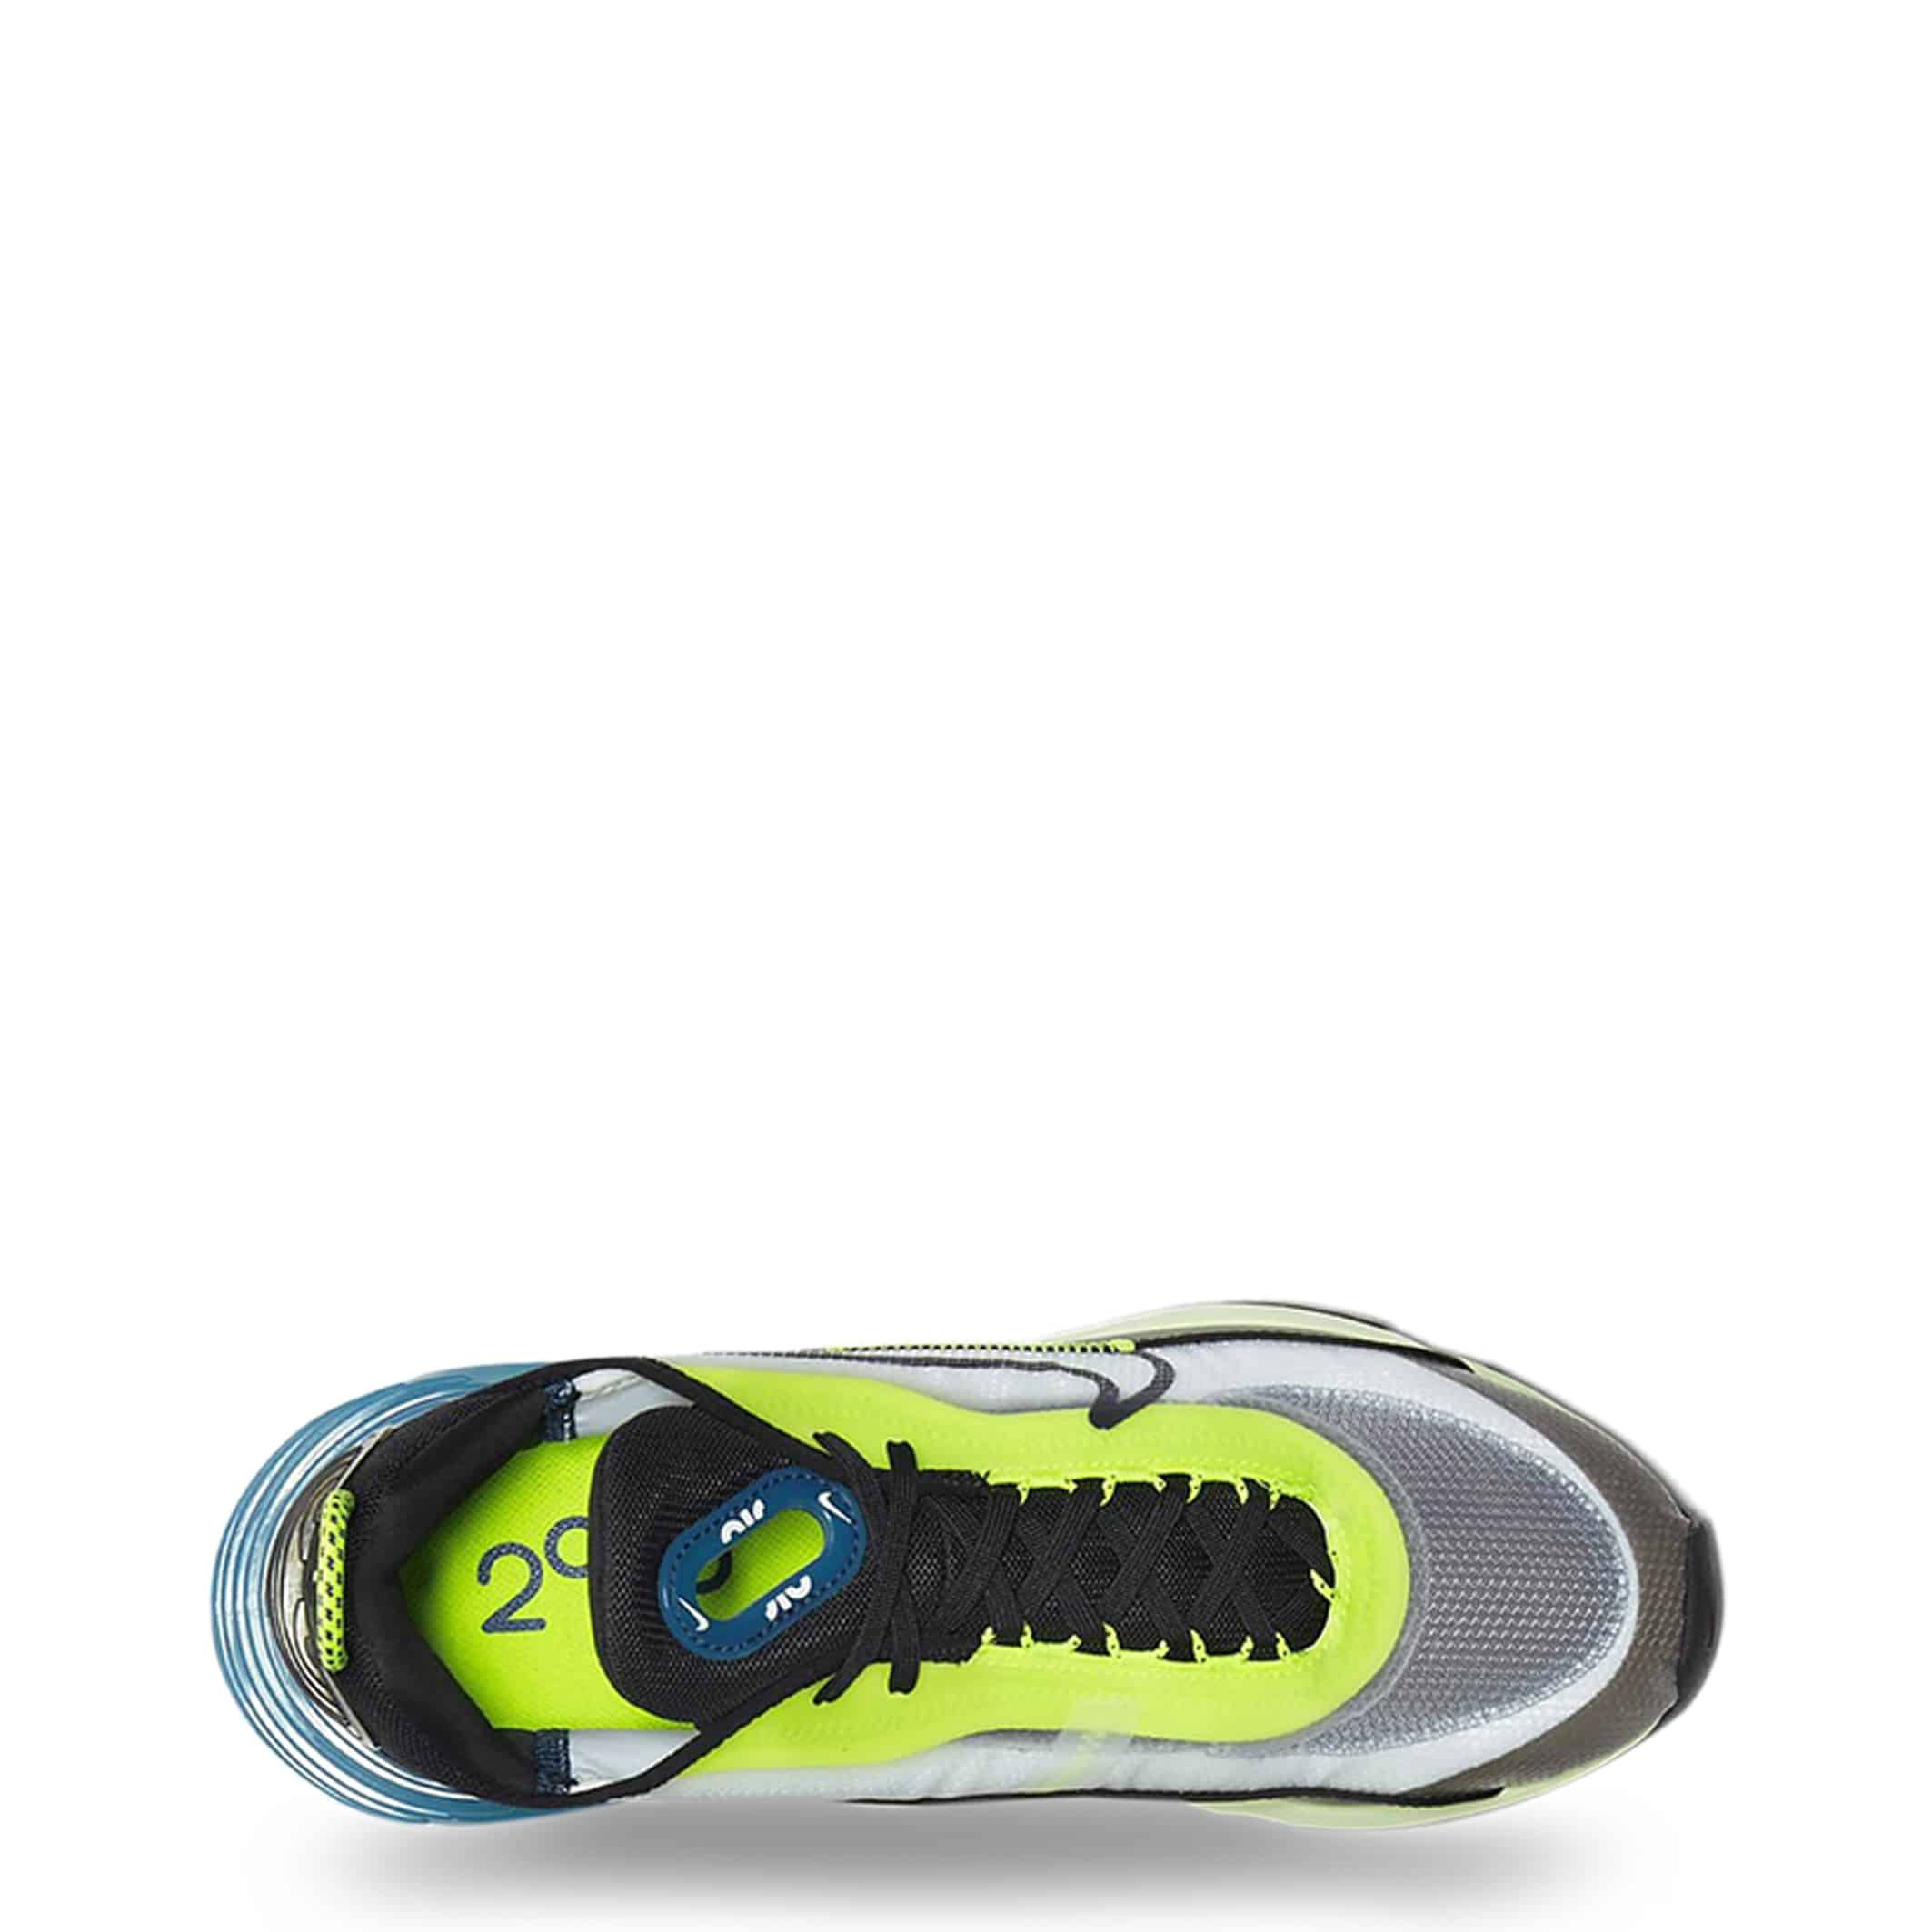 Nike - AirMax2090 | You Fashion Outlet